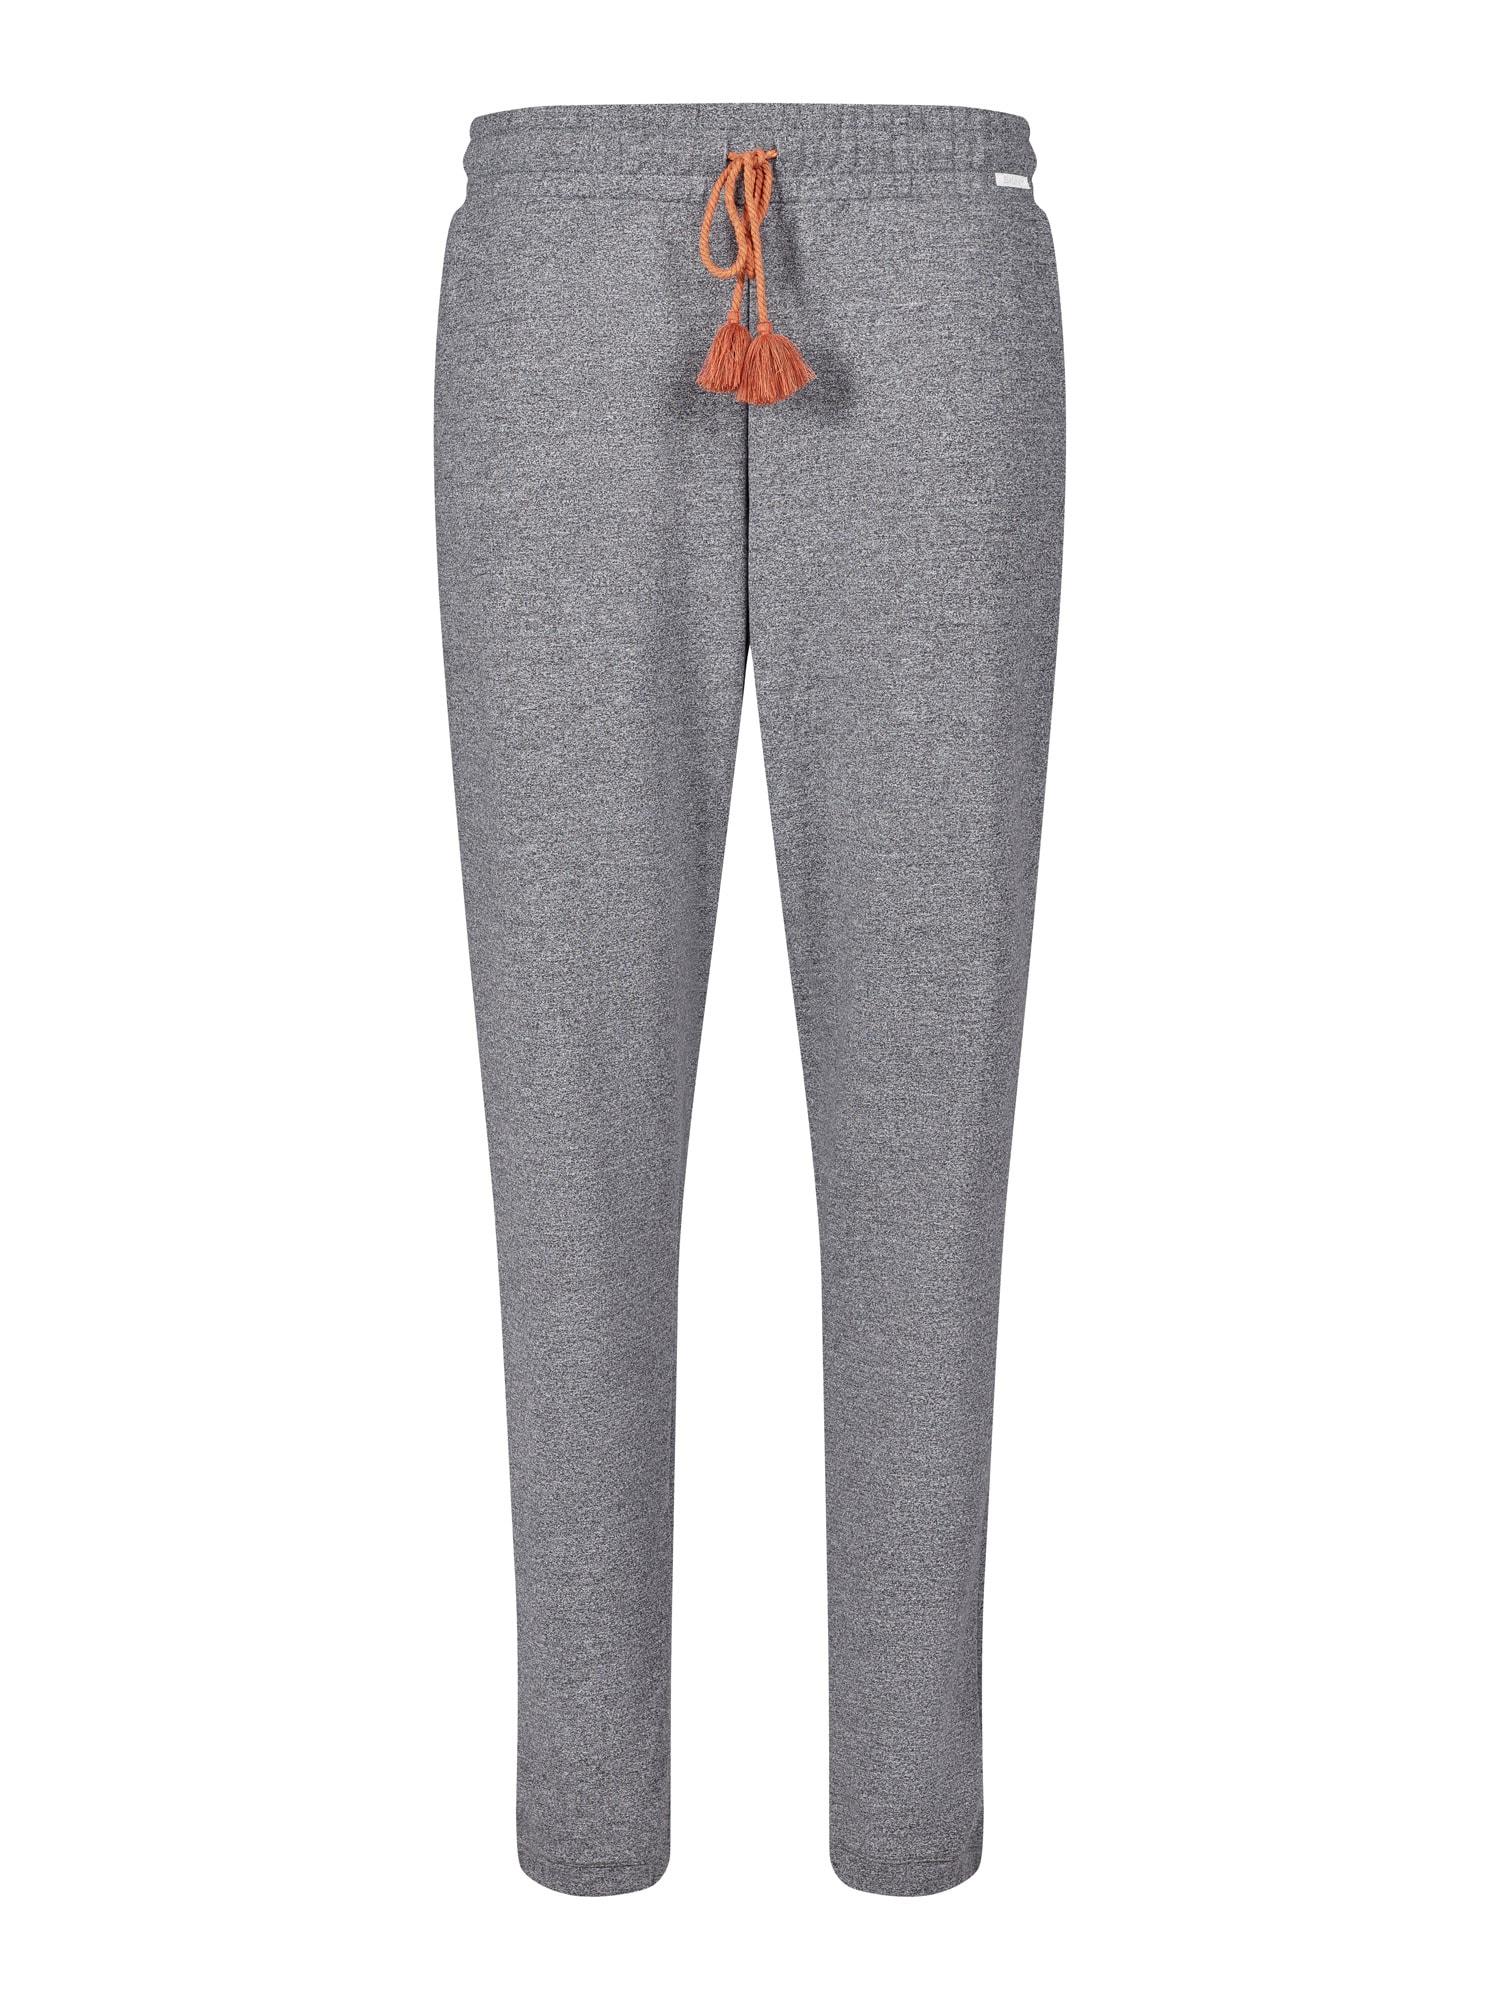 Skiny Pyžamové kalhoty  šedý melír